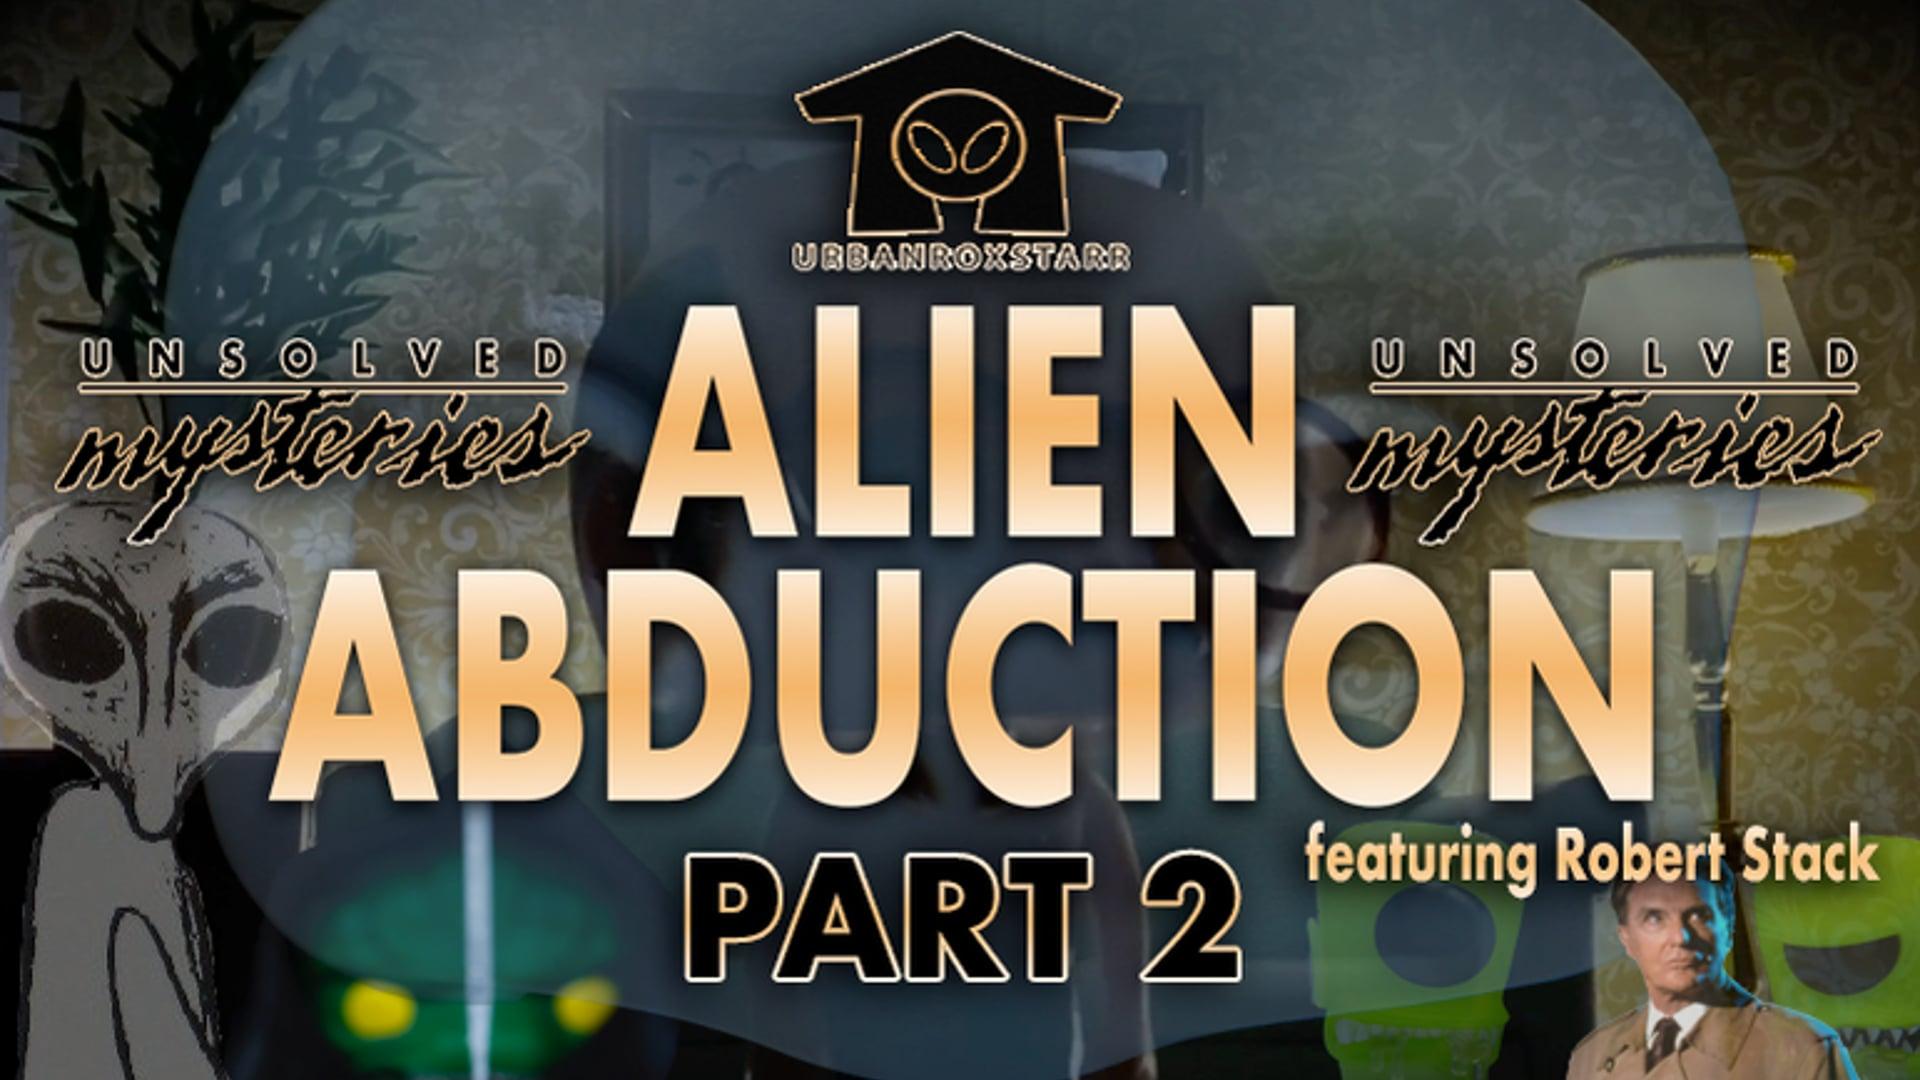 Alien Abduction part 2 (featuring Robert Stack)